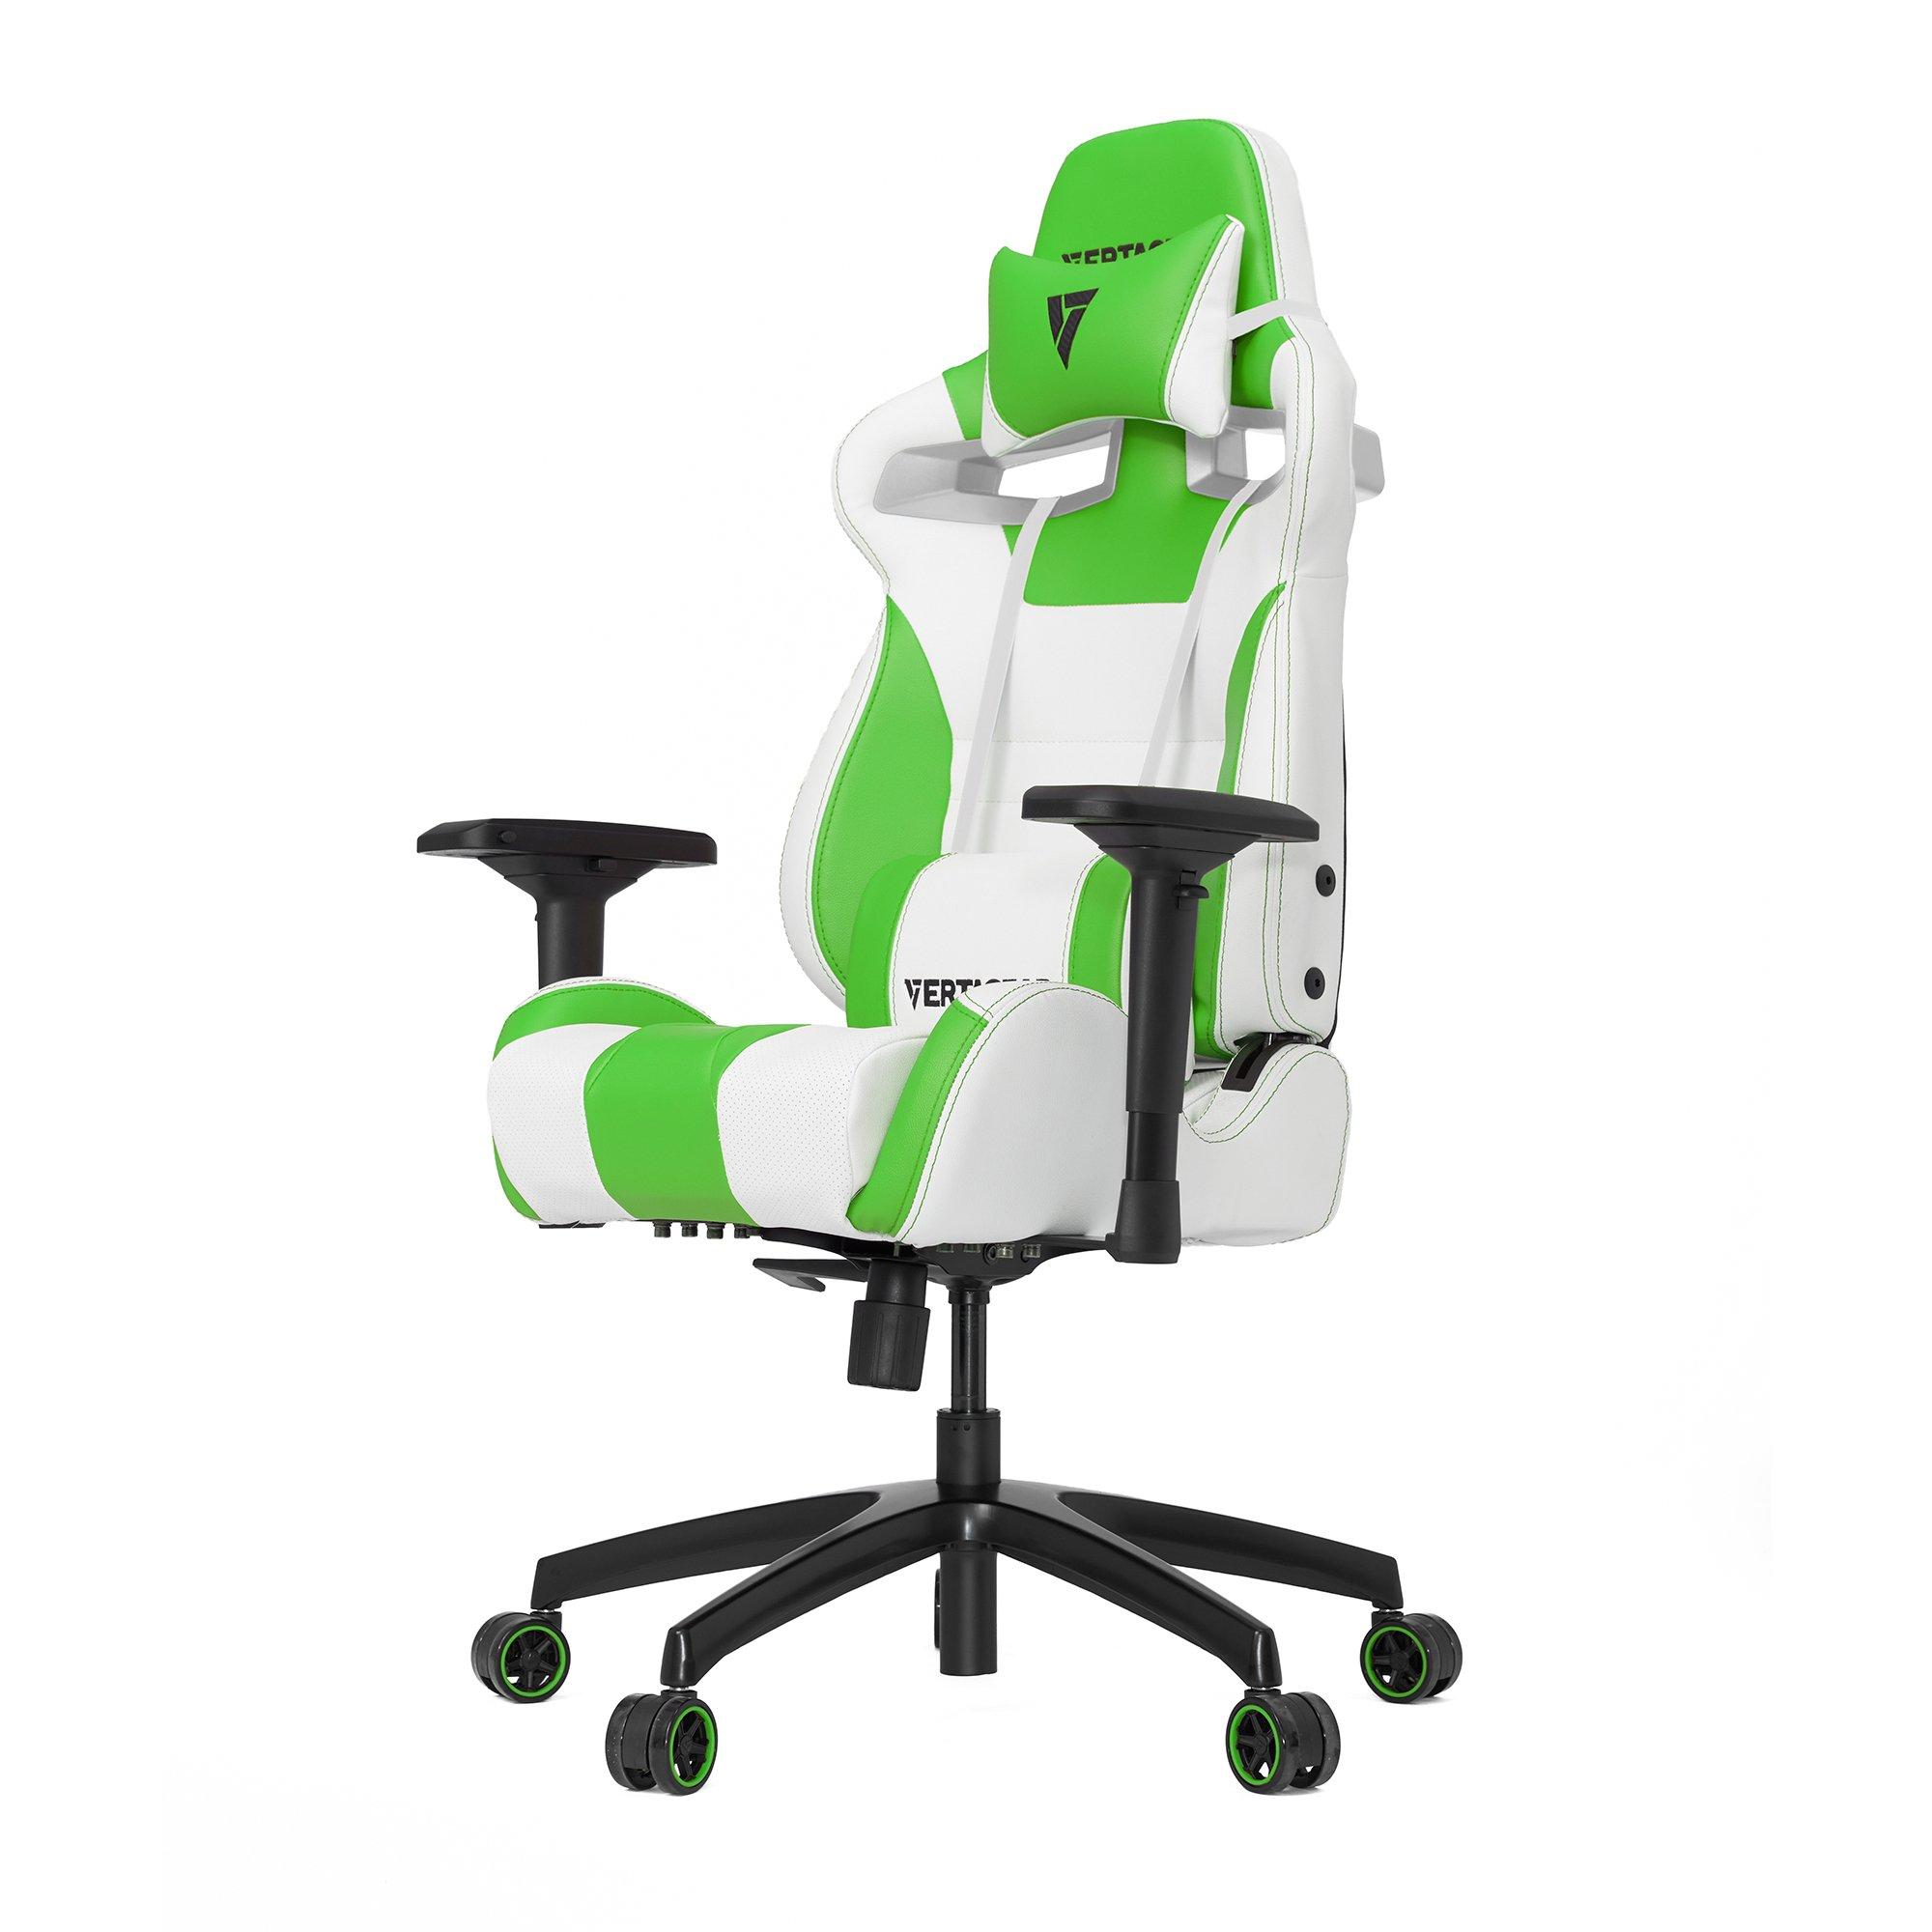 Vertagear S-Line SL4000 Racing Series Gaming Chair - White/Green (Rev. 2)